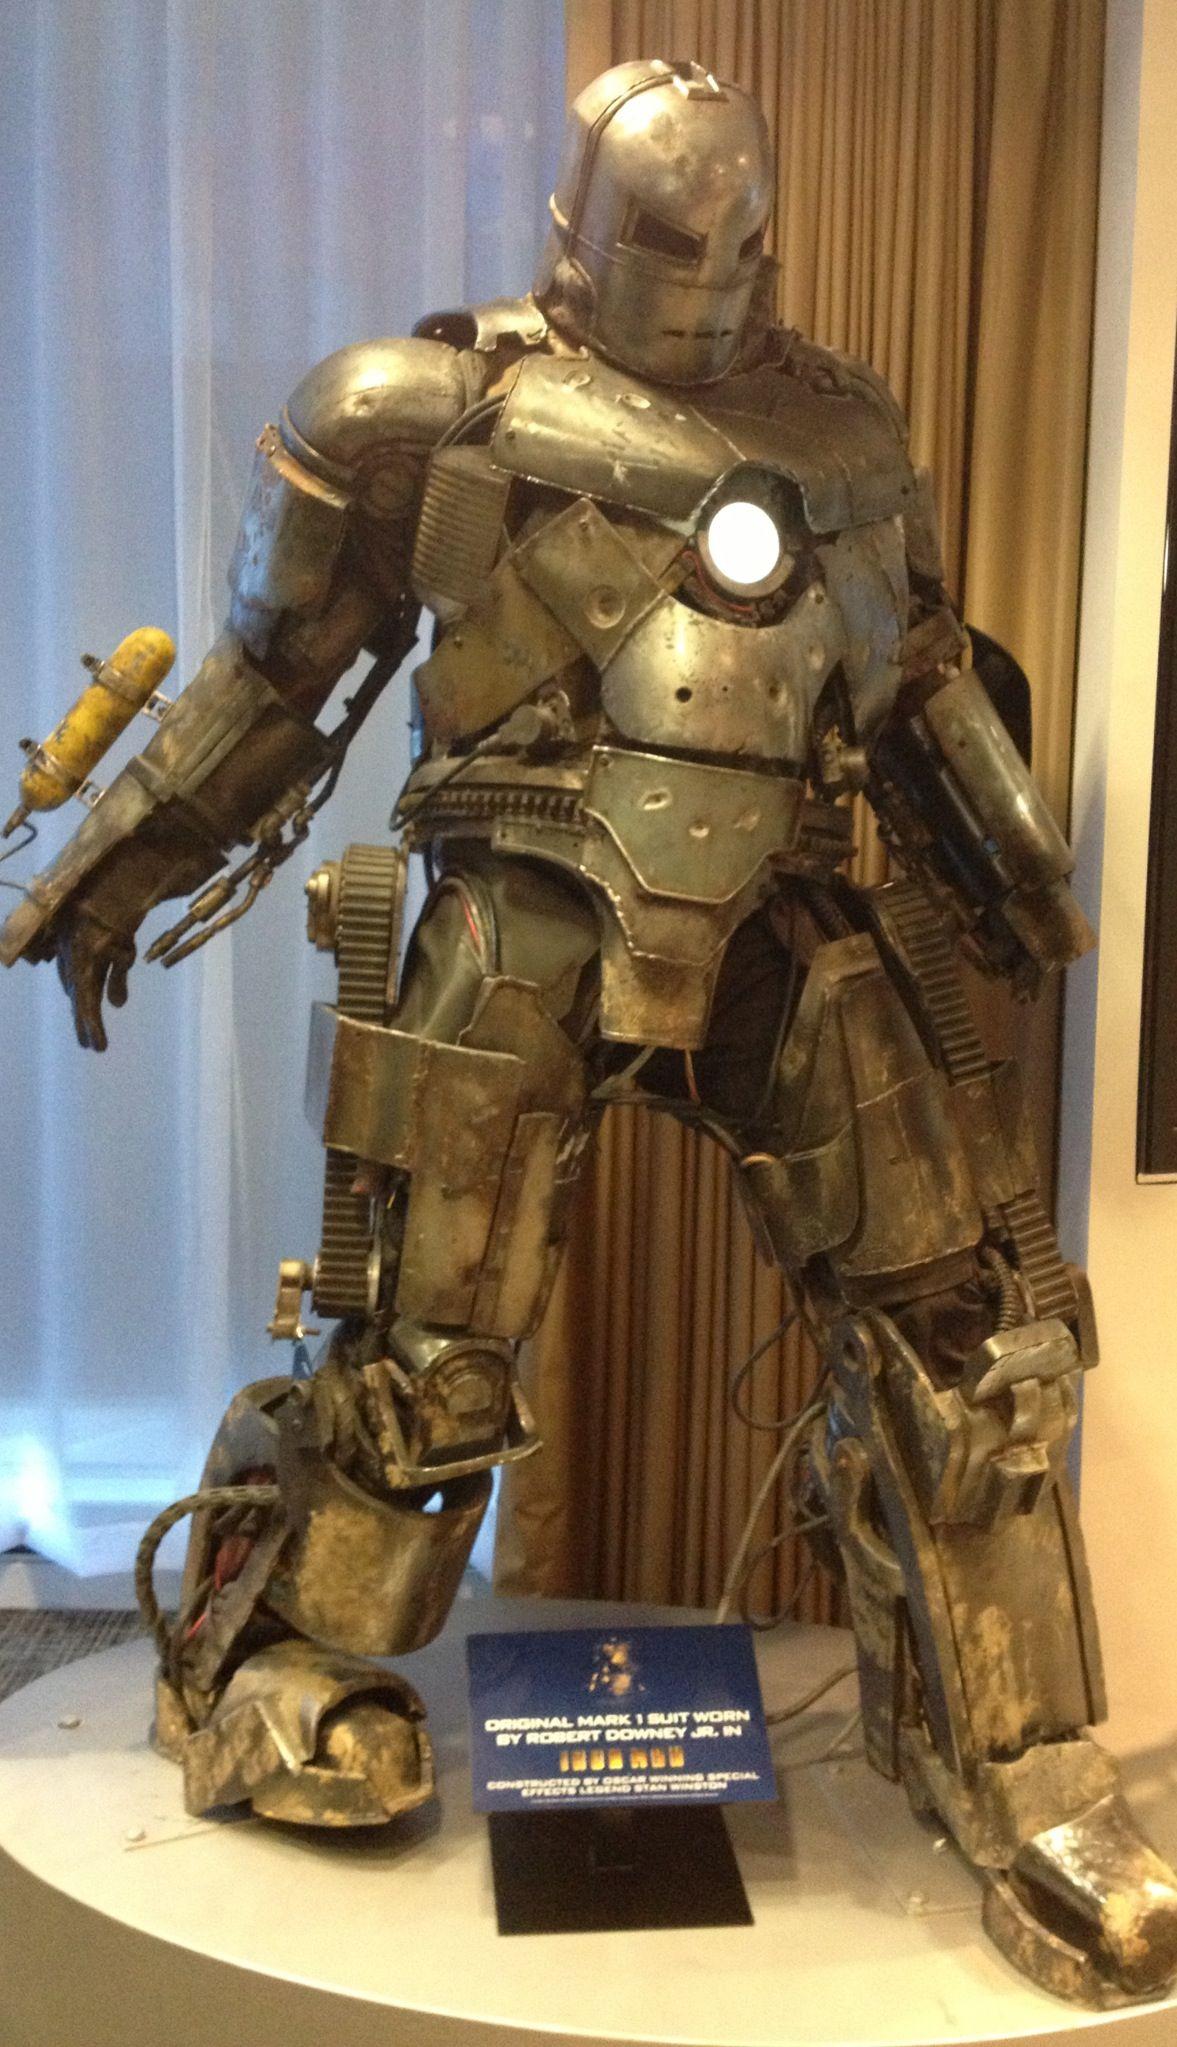 Original Iron Man Suit Worn By Robert Downey Jr In